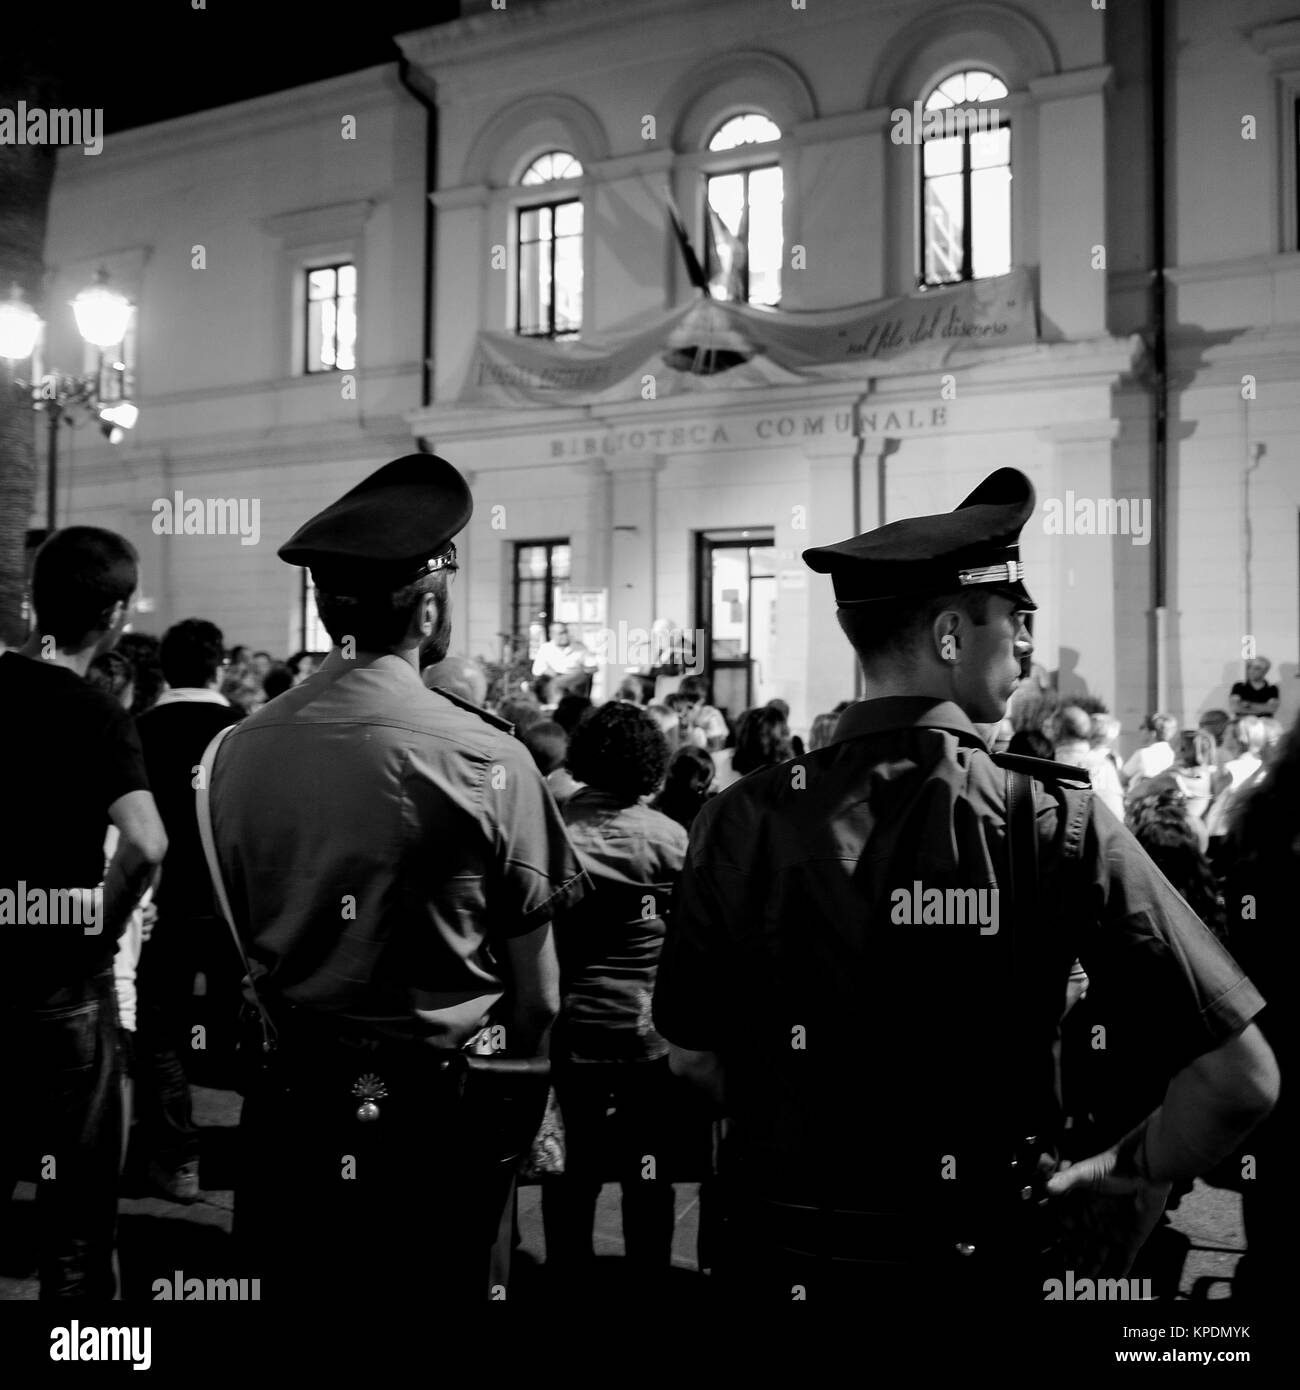 'Carabinieri', italian gendarmery officers, patrol at night in the touristic center of Olbia, Sardinia, - Stock Image